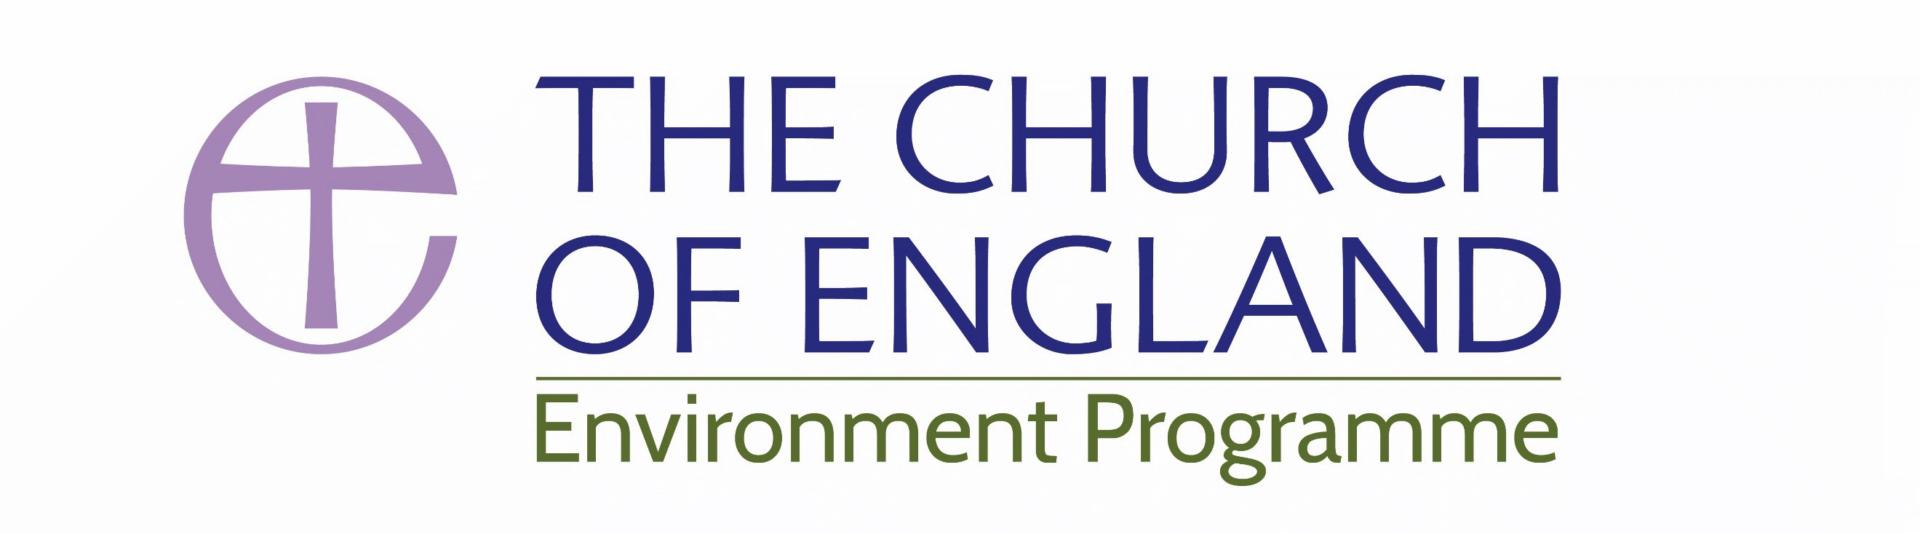 Enviroment Programme